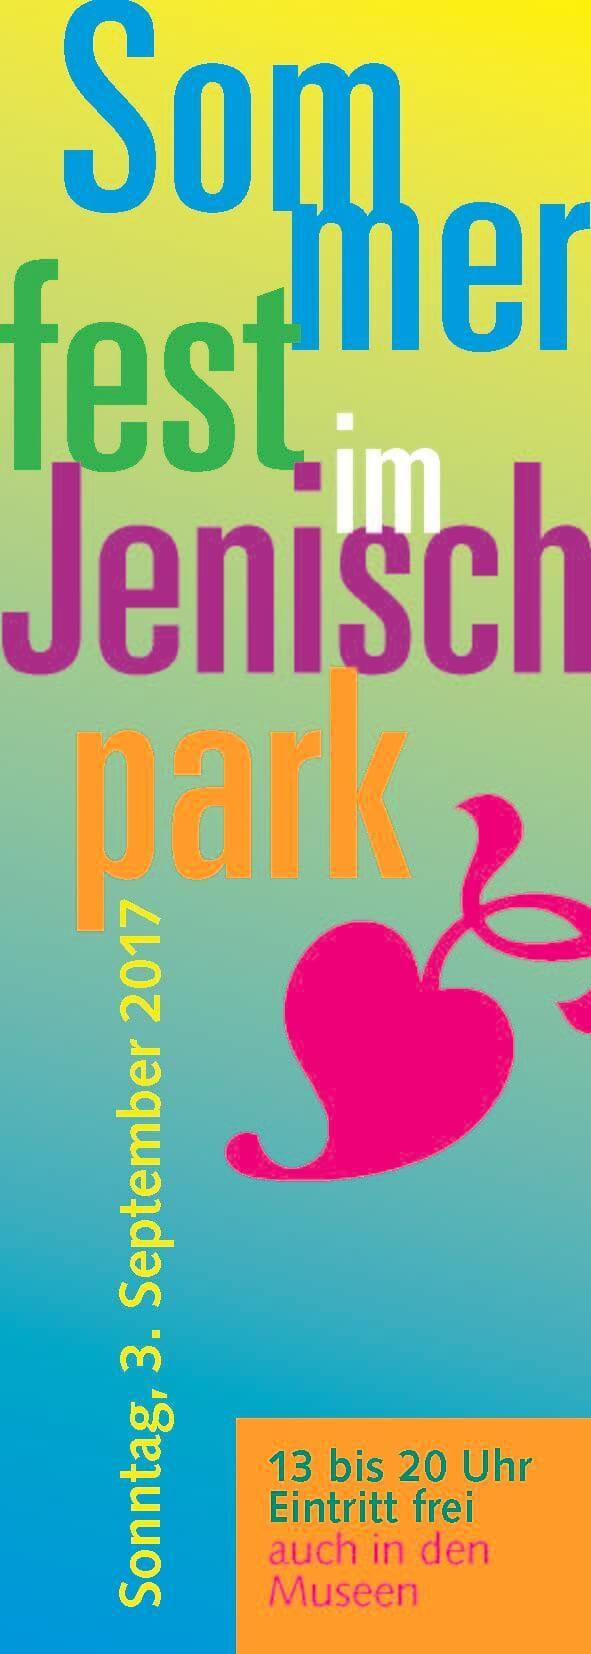 Sommerfest im Jenischpark - https://sommer-in-hamburg.de/kultur/sommerfest-jenischpark/?utm_source=PN&utm_medium=Supermark&utm_campaign=SNAP%2Bfrom%2BSommer+in+Hamburg+-+Die+Liebe+zur+sch%C3%B6nsten+Stadt+der+Welt